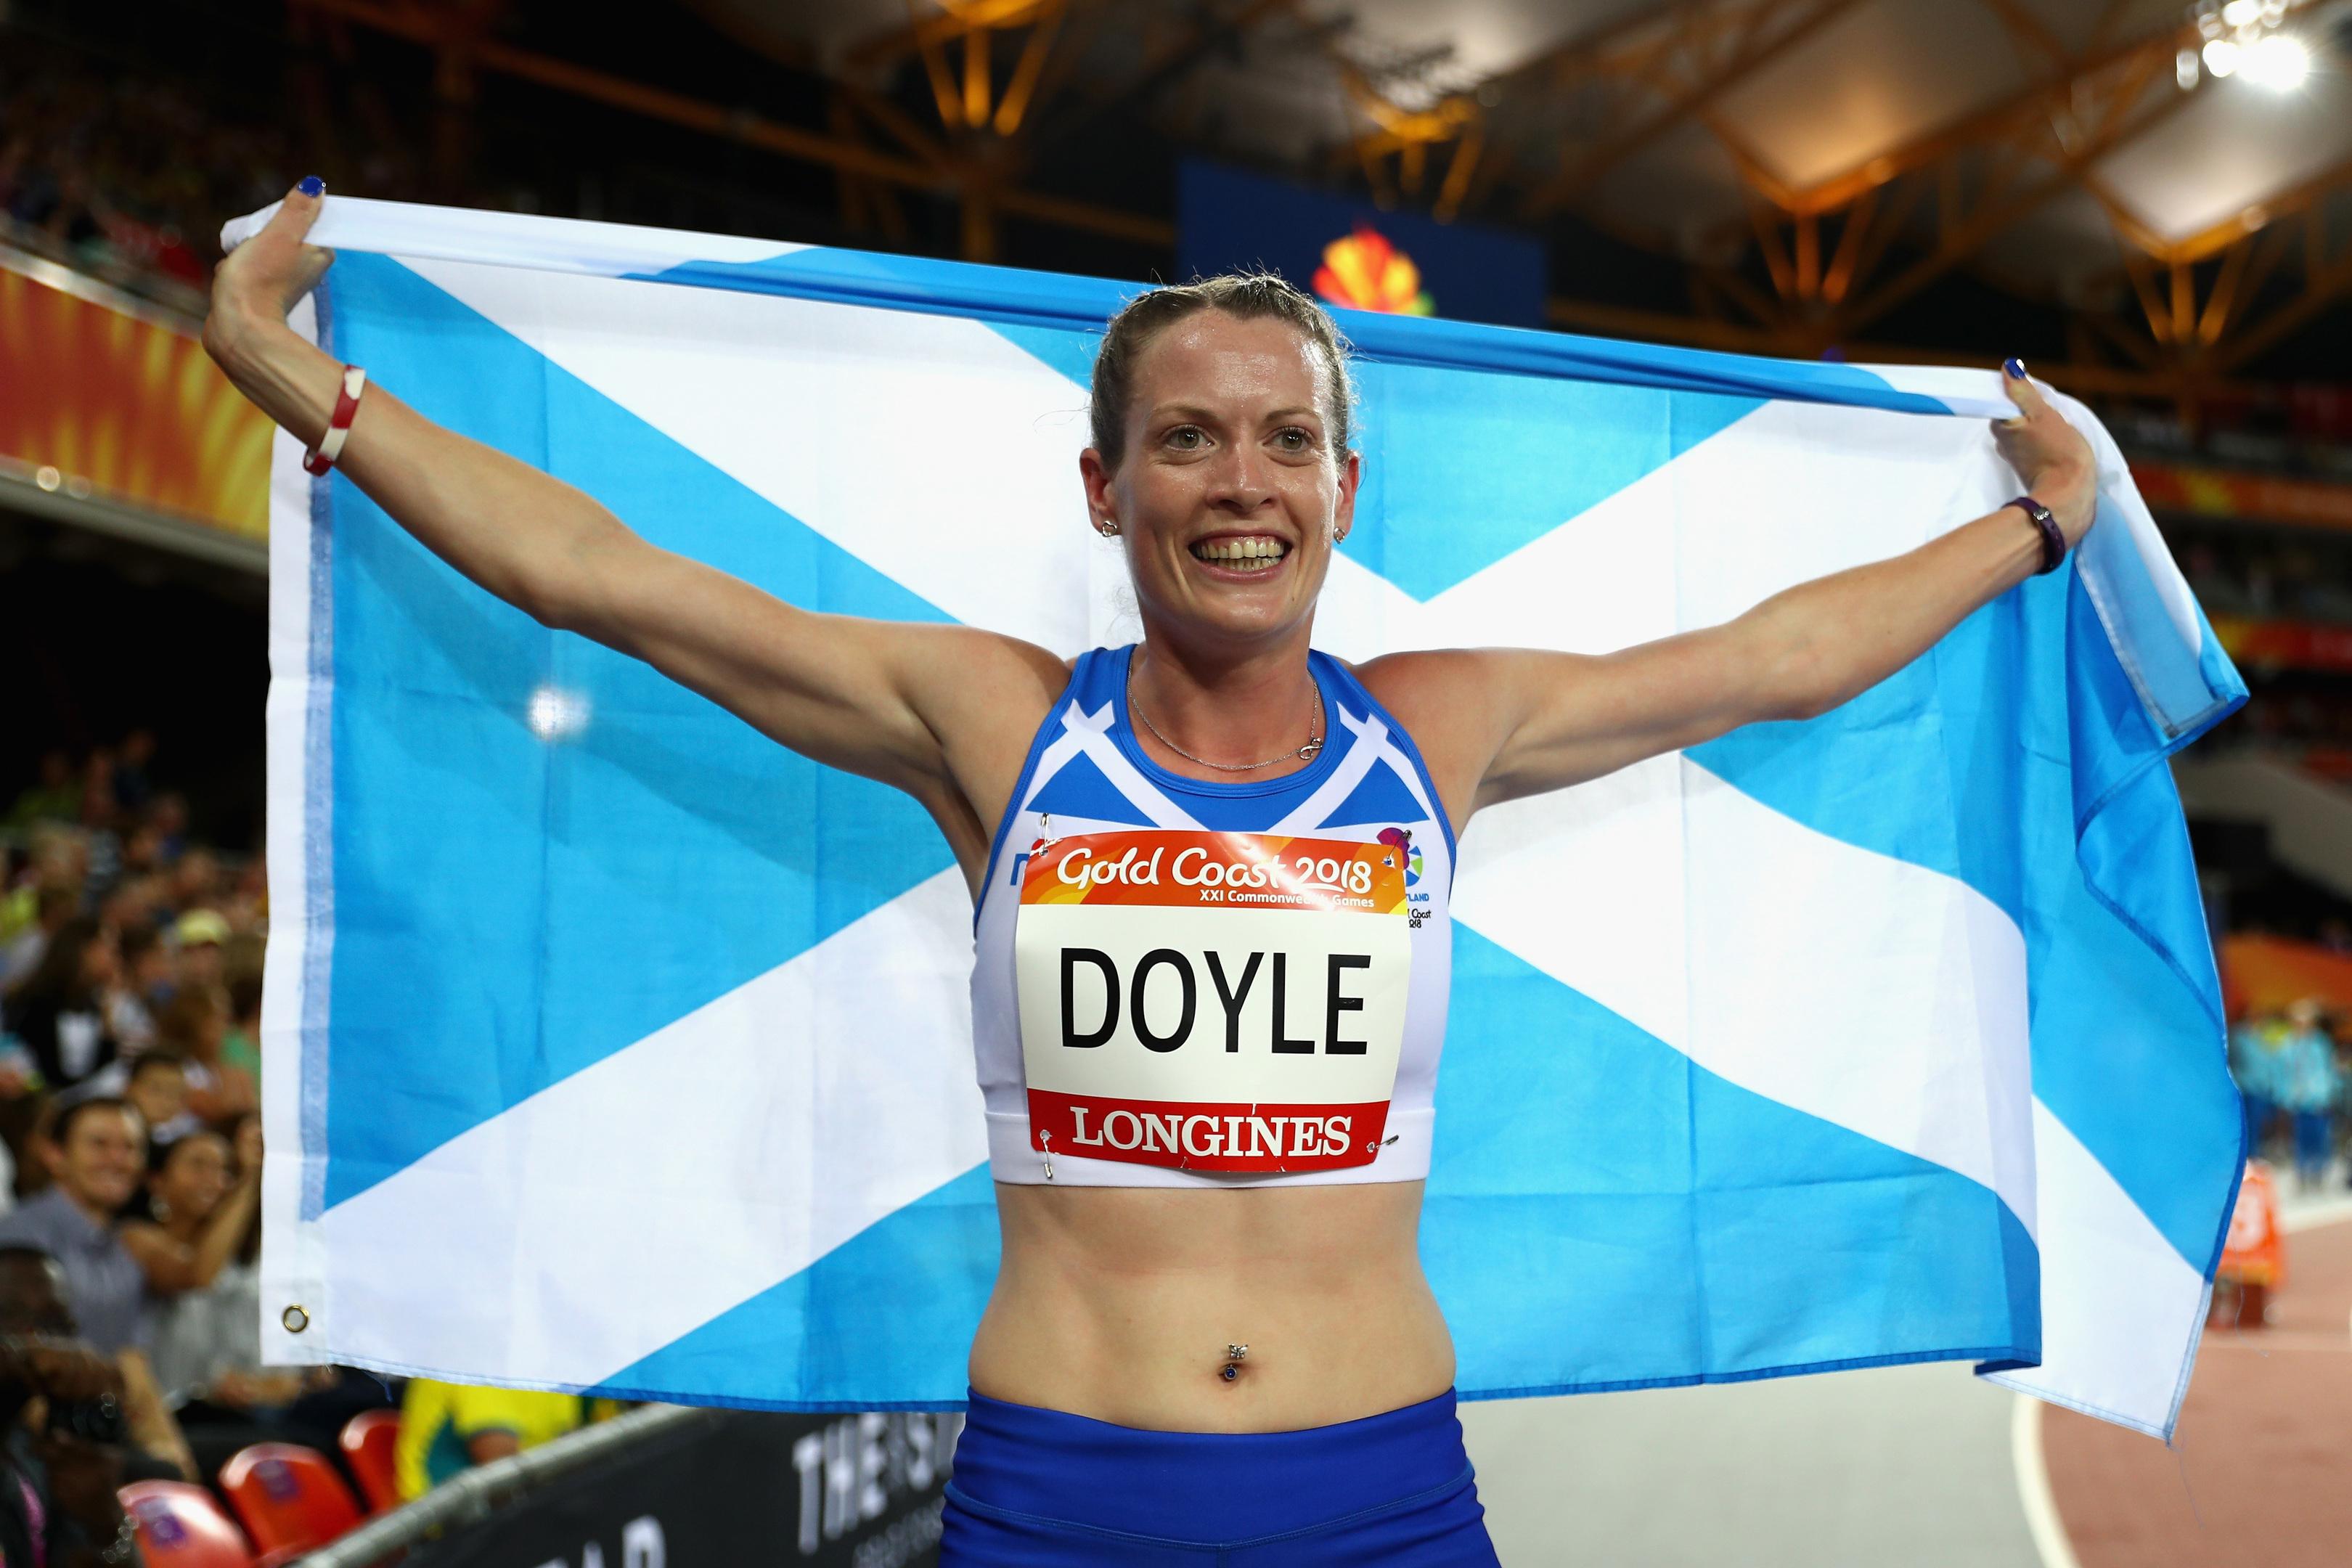 Eilidh Doyle celebrates winning silver in the women's 400 metres hurdles final